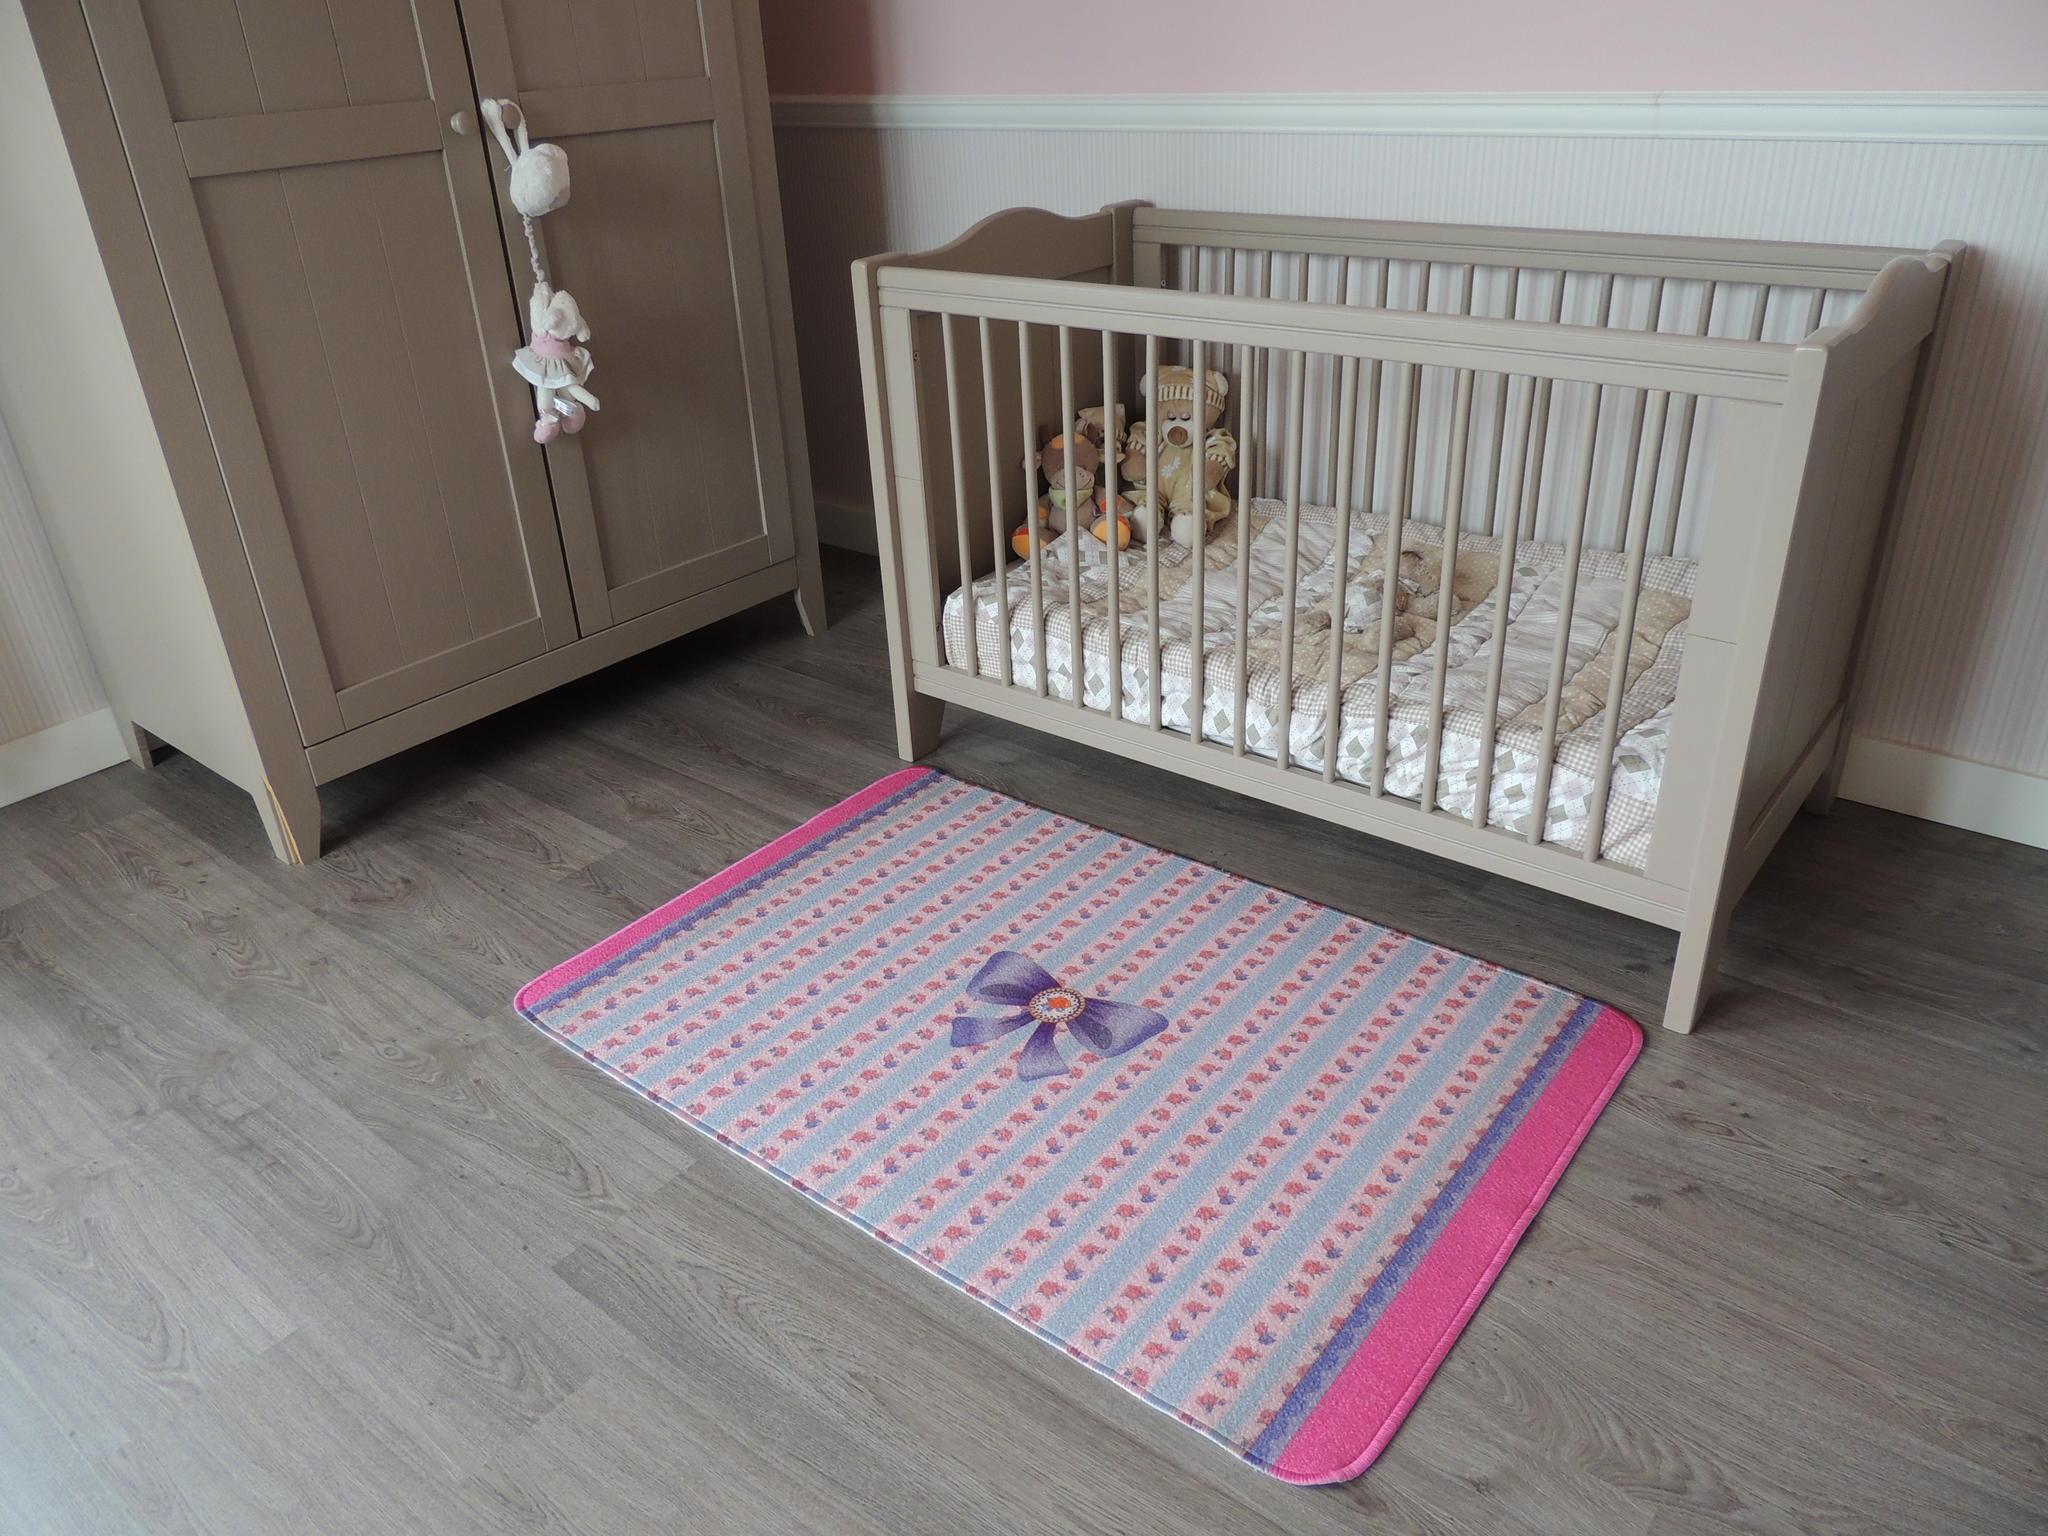 Roze Blauwe Kinderkamers : Onlinespeelkleed mooi vloerkleed babykamer in roze of